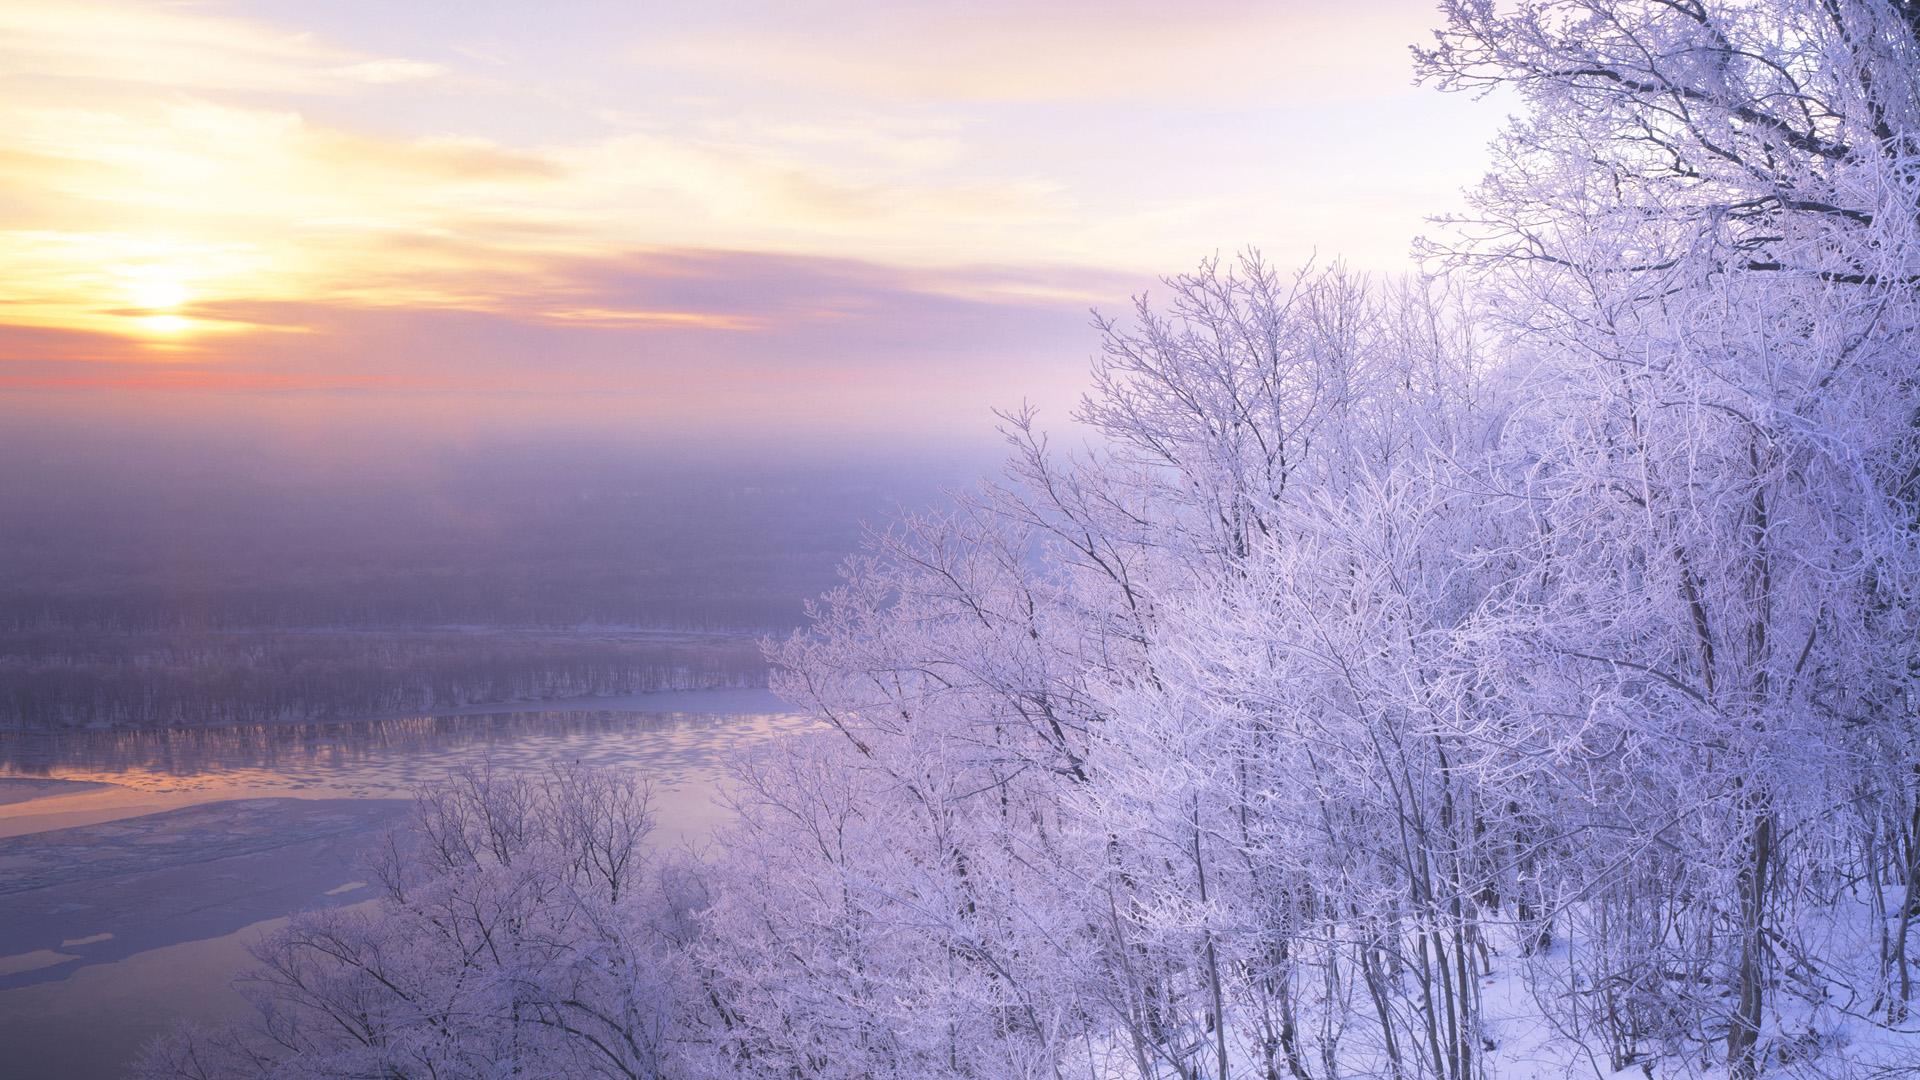 Beautiful Snow Scenery wallpaper   936515 1920x1080